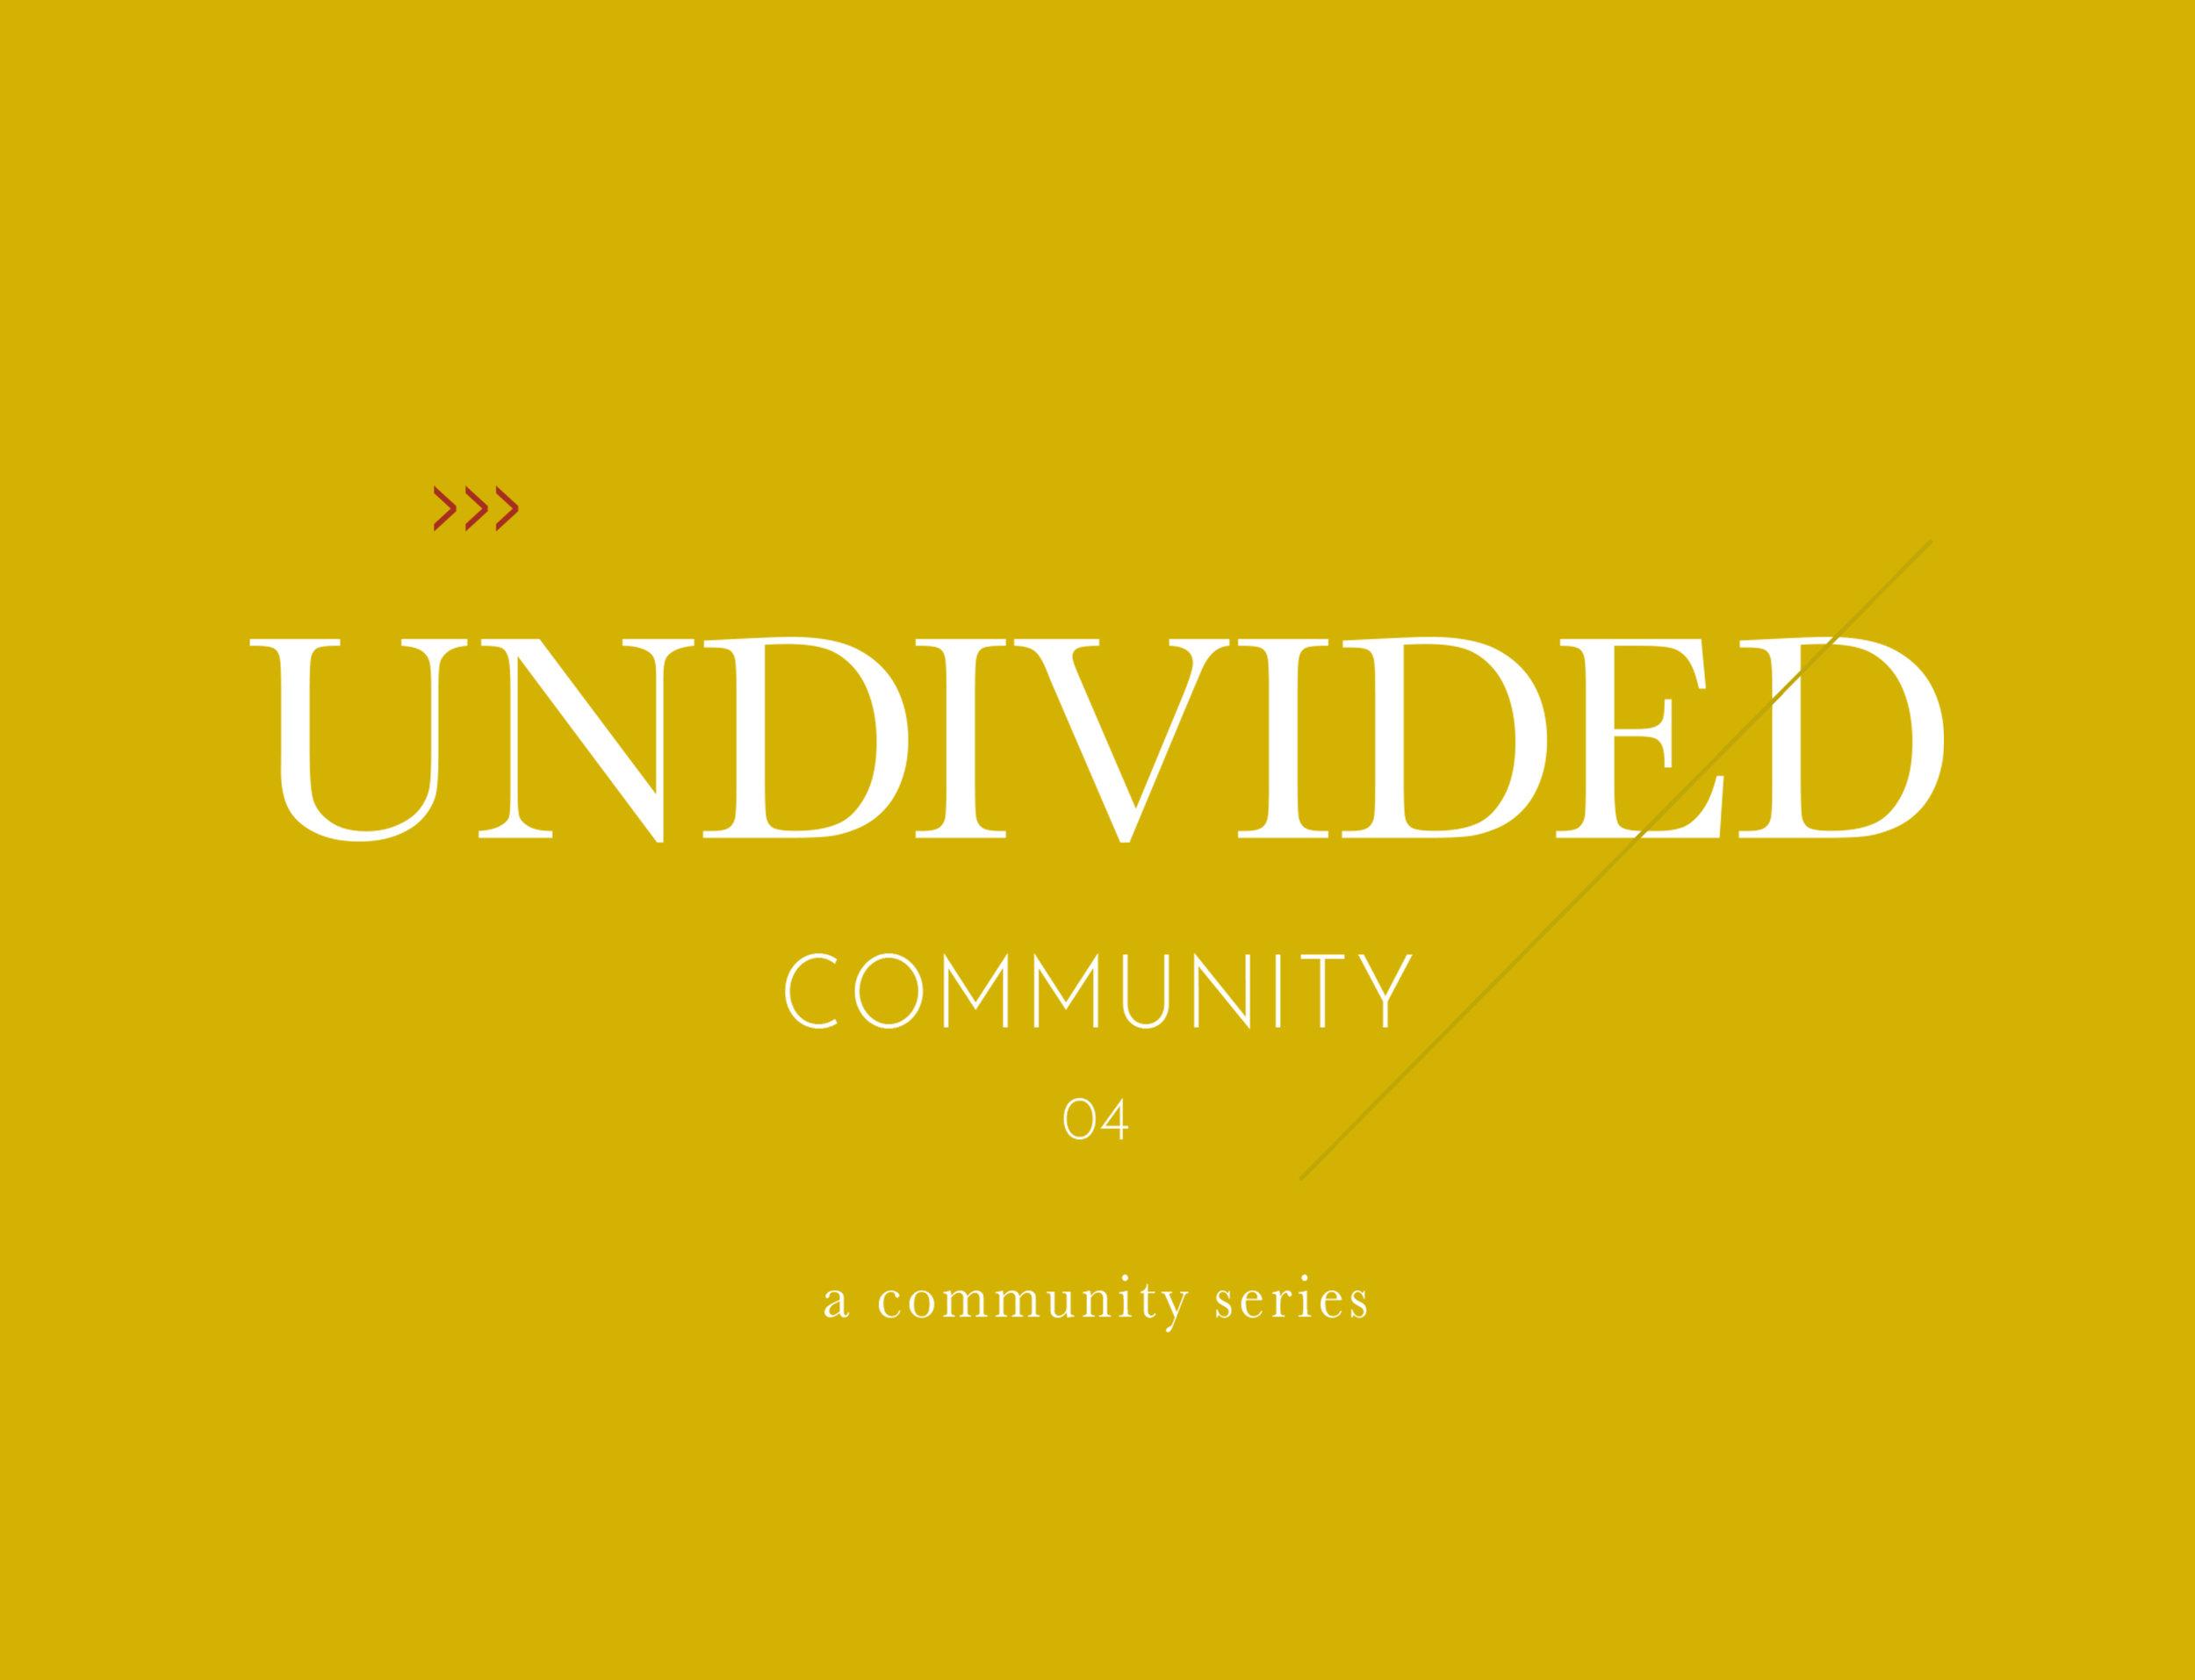 Undivided-Community5.jpg